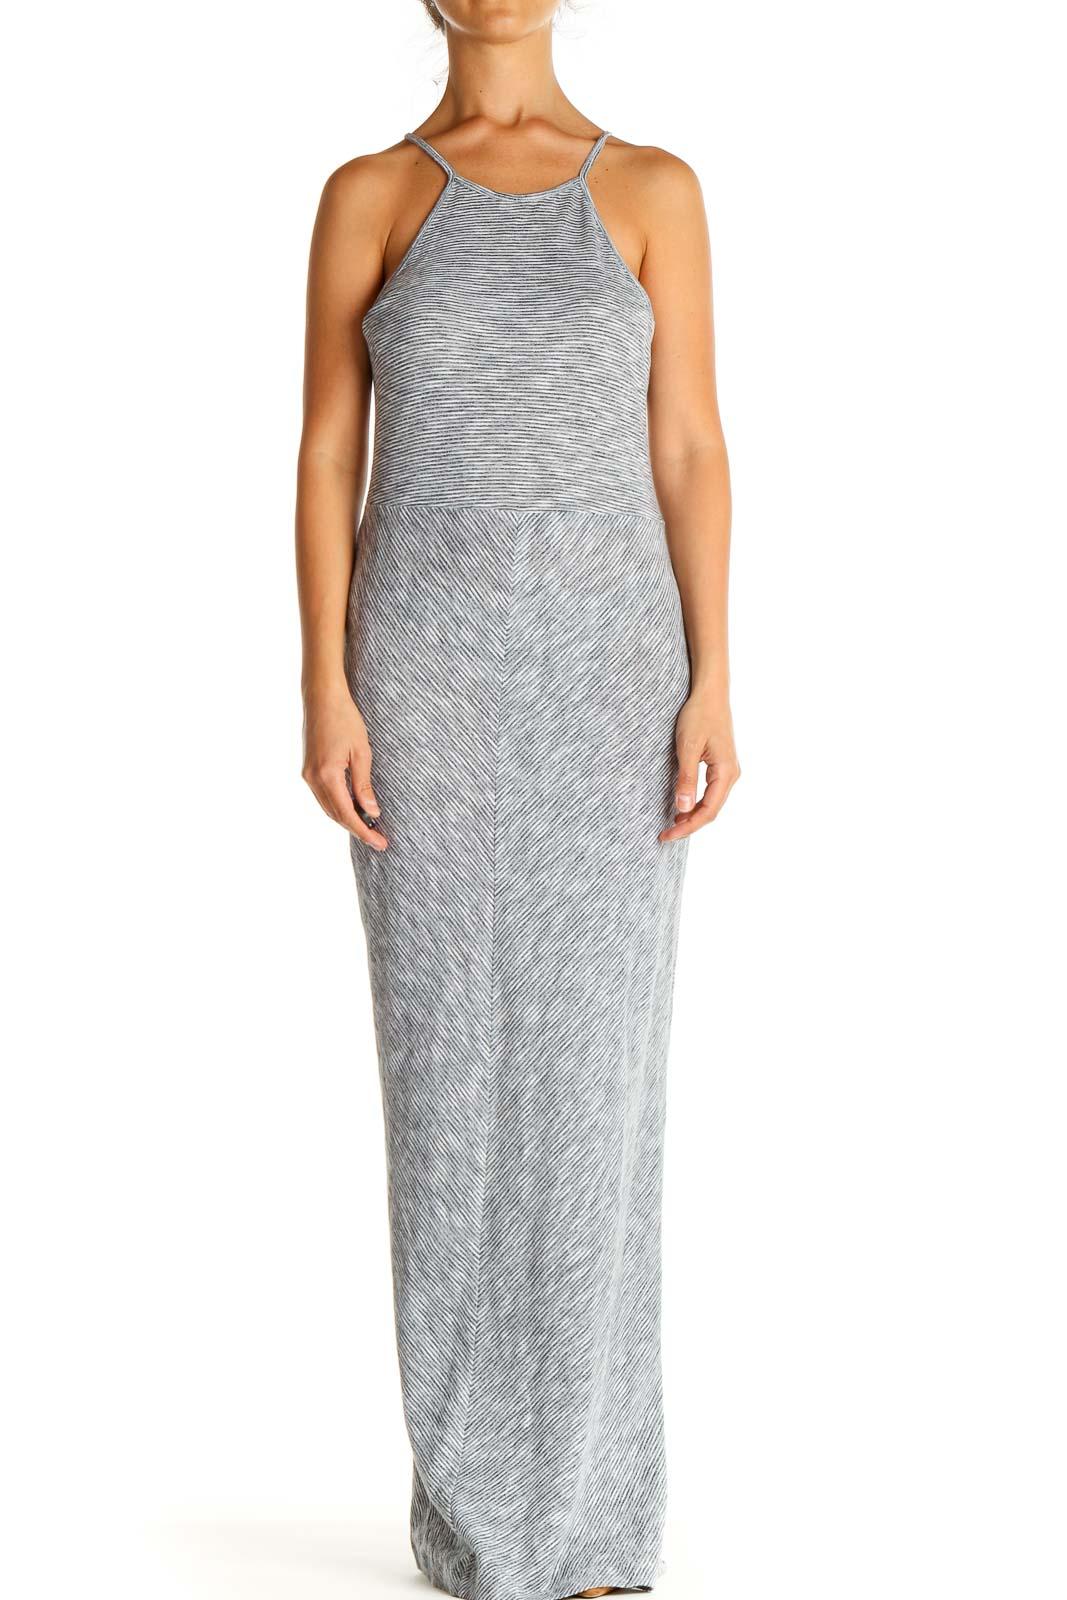 Gray Textured Classic Column Dress Front